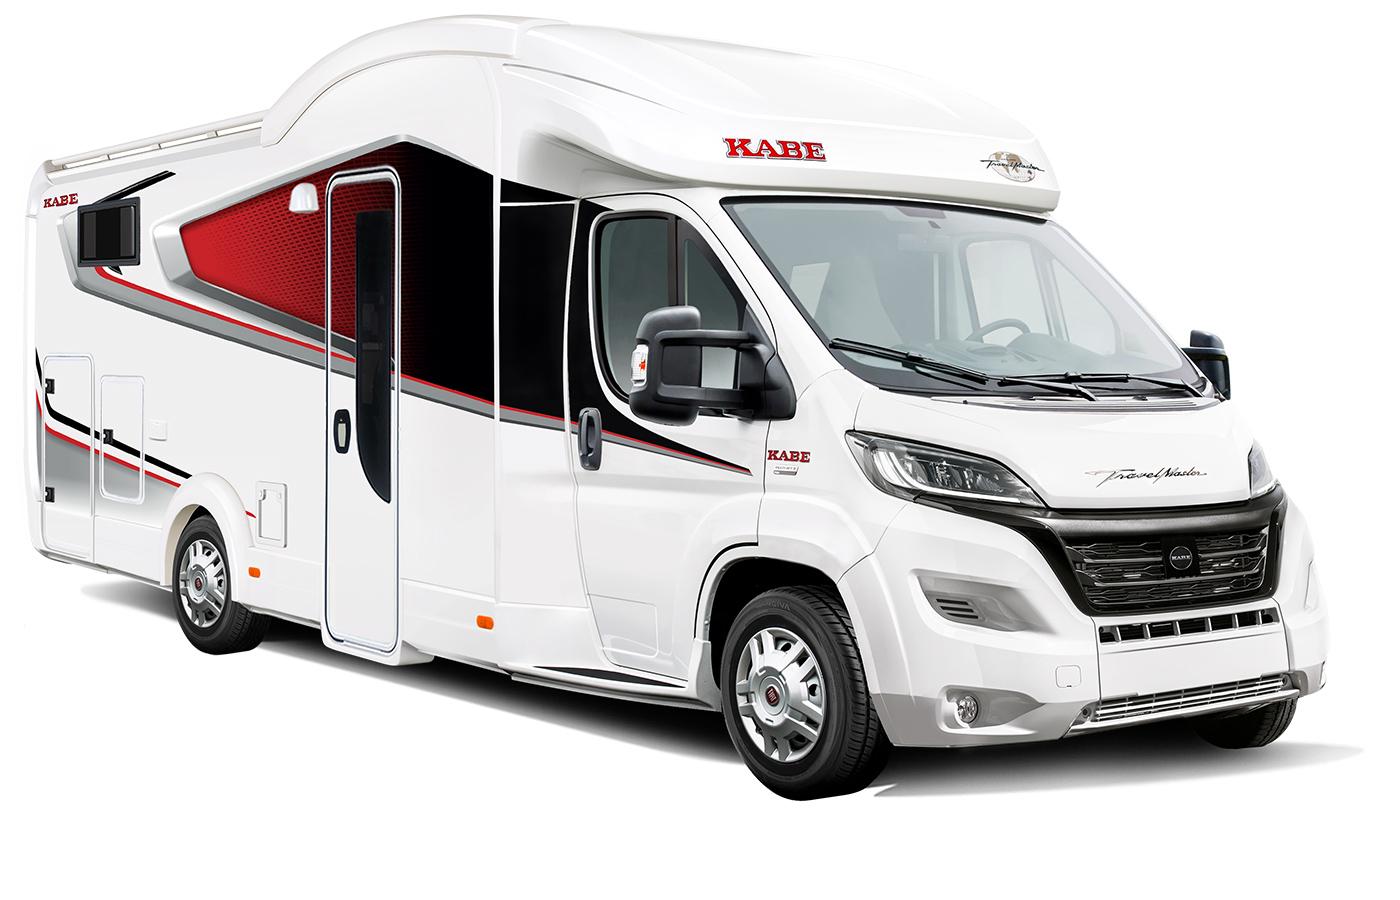 Kabe Classic x740 LGB